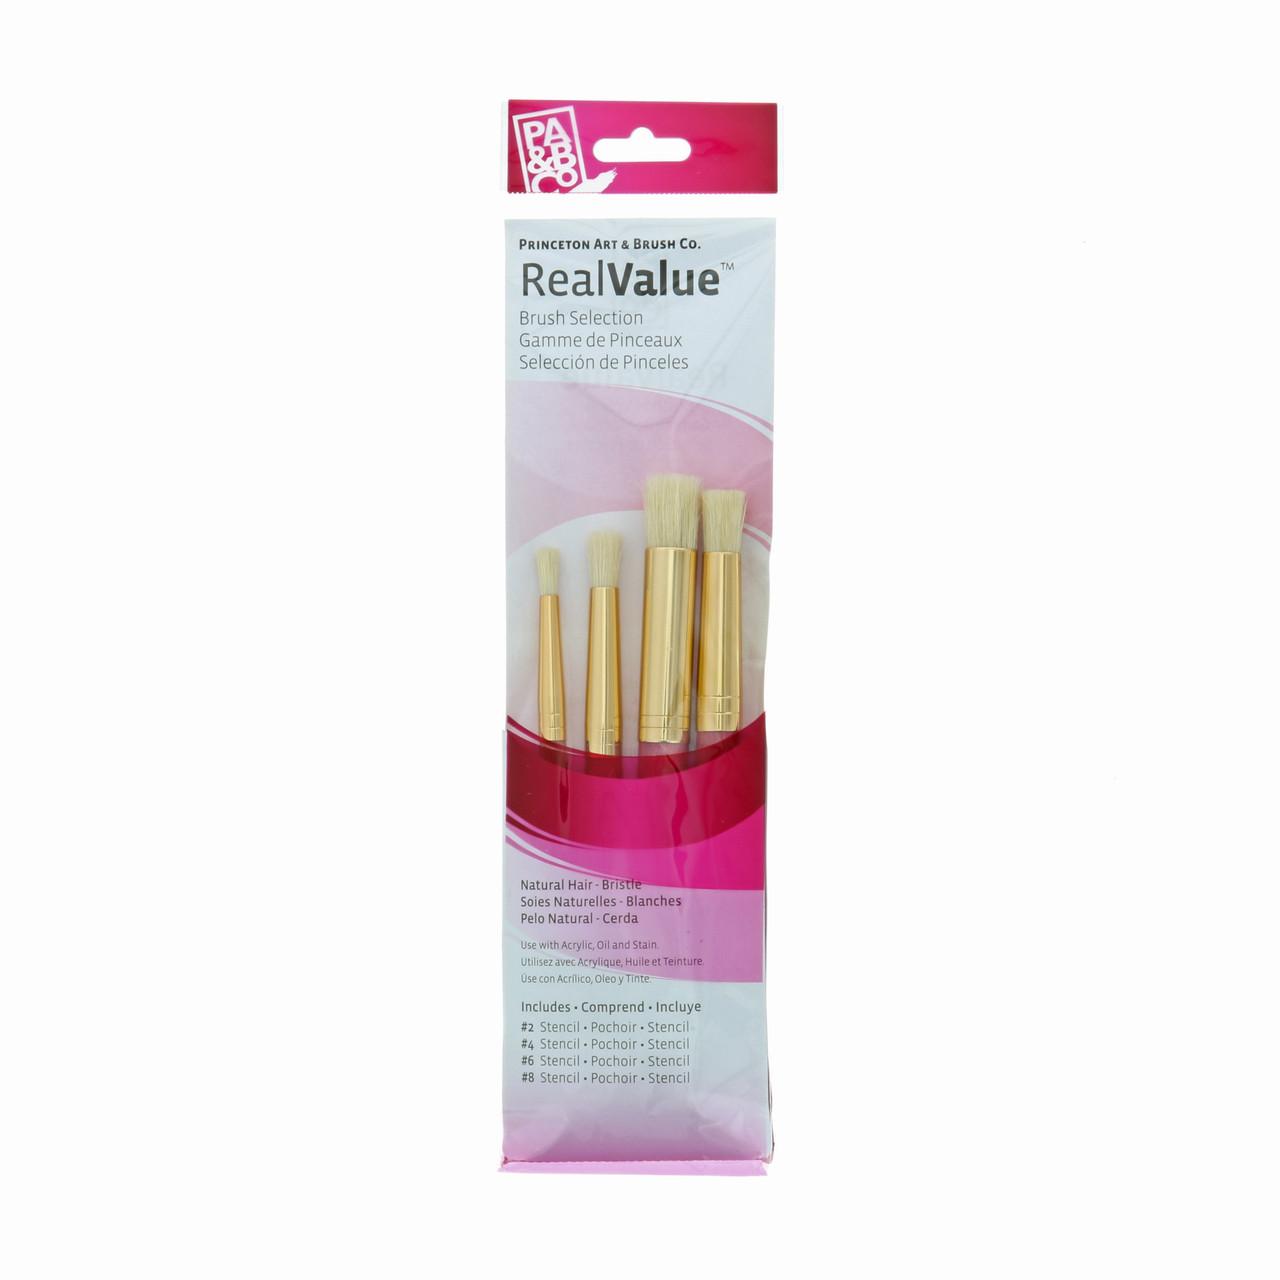 Natural-Bristle 4-Brush Set Stencil 2, 4, 6, 8